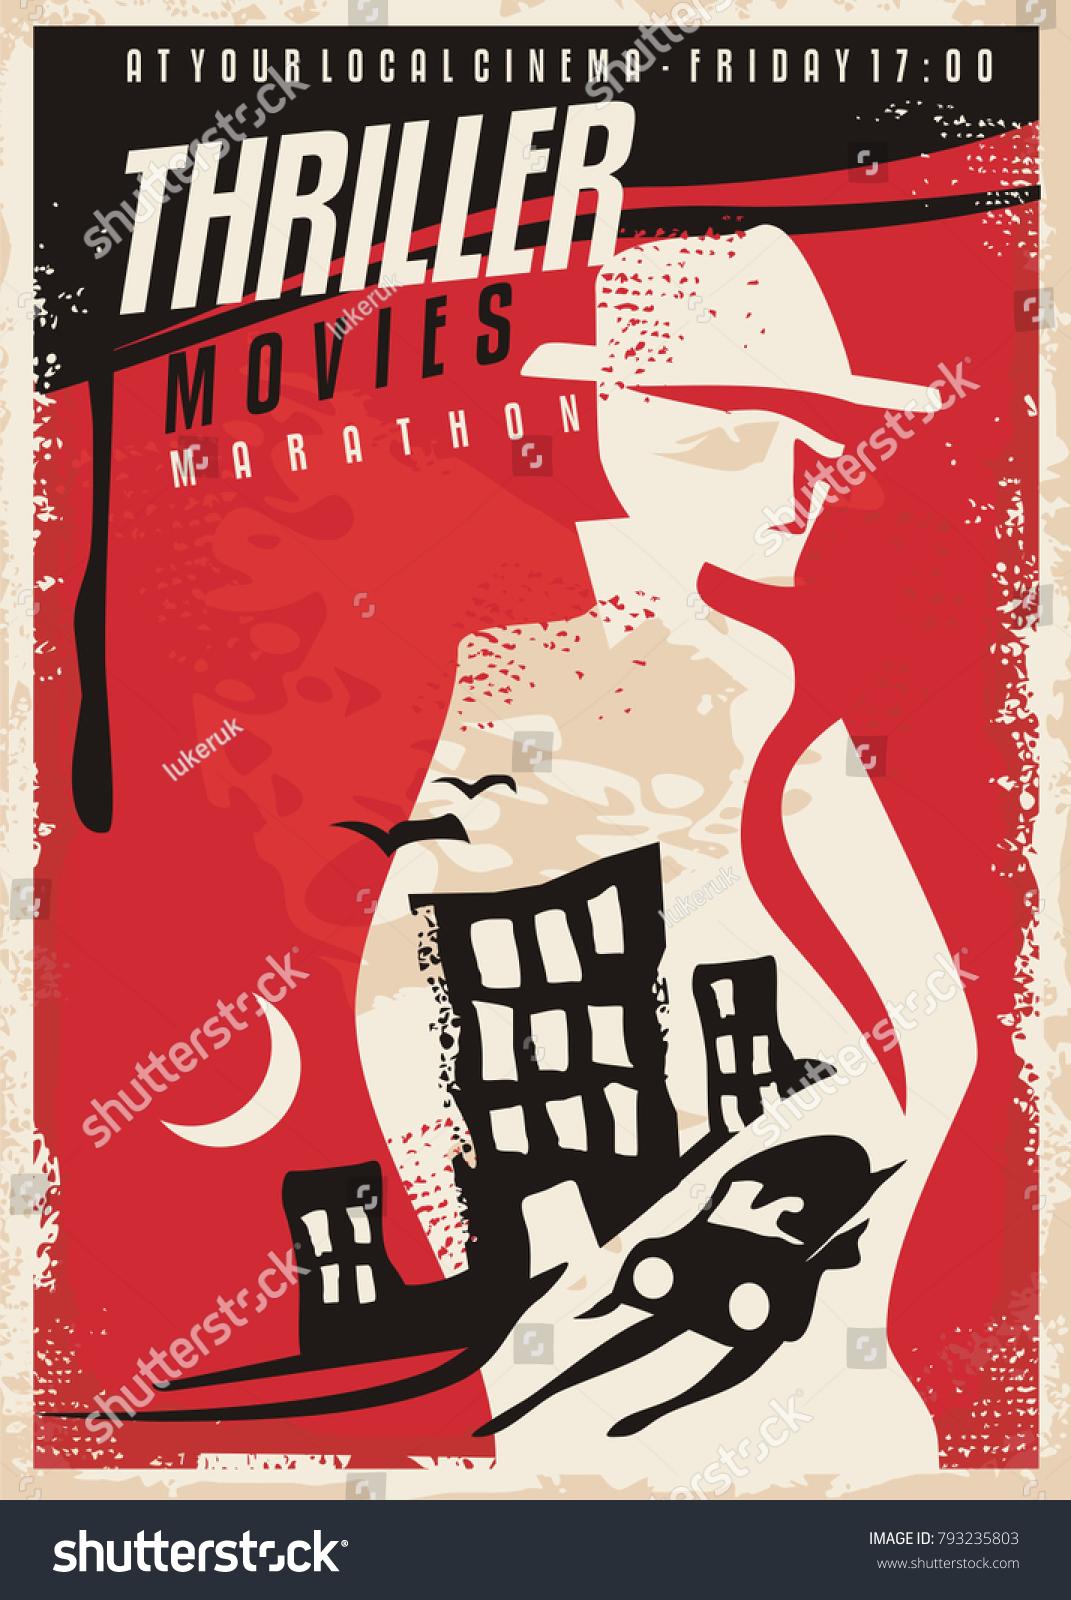 Creative Poster Design Thriller Movie Show Stock-Vektorgrafik ...